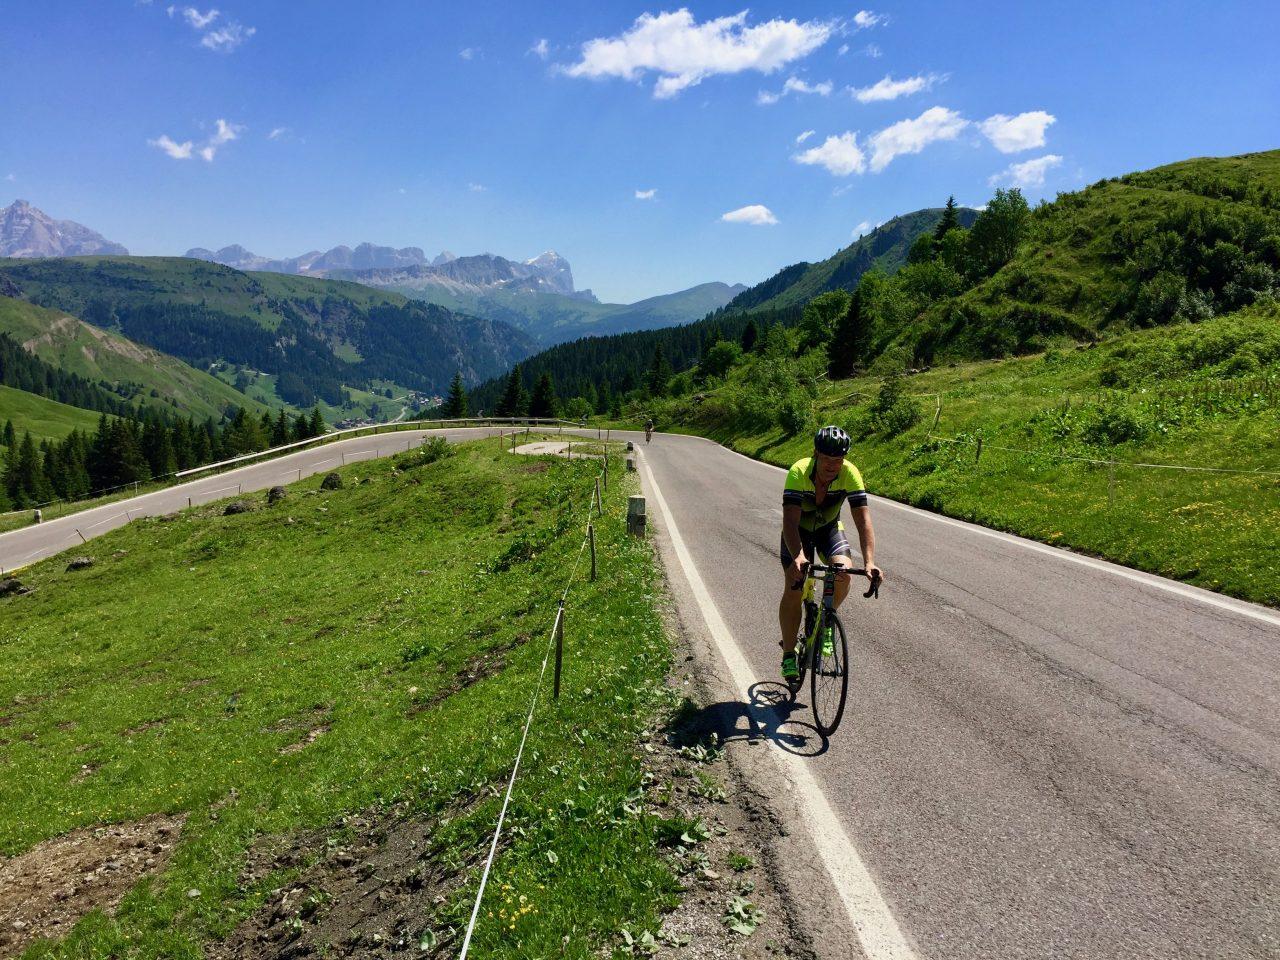 Andi, Auffahrt Passo Pordoi, Dolomites, Italy